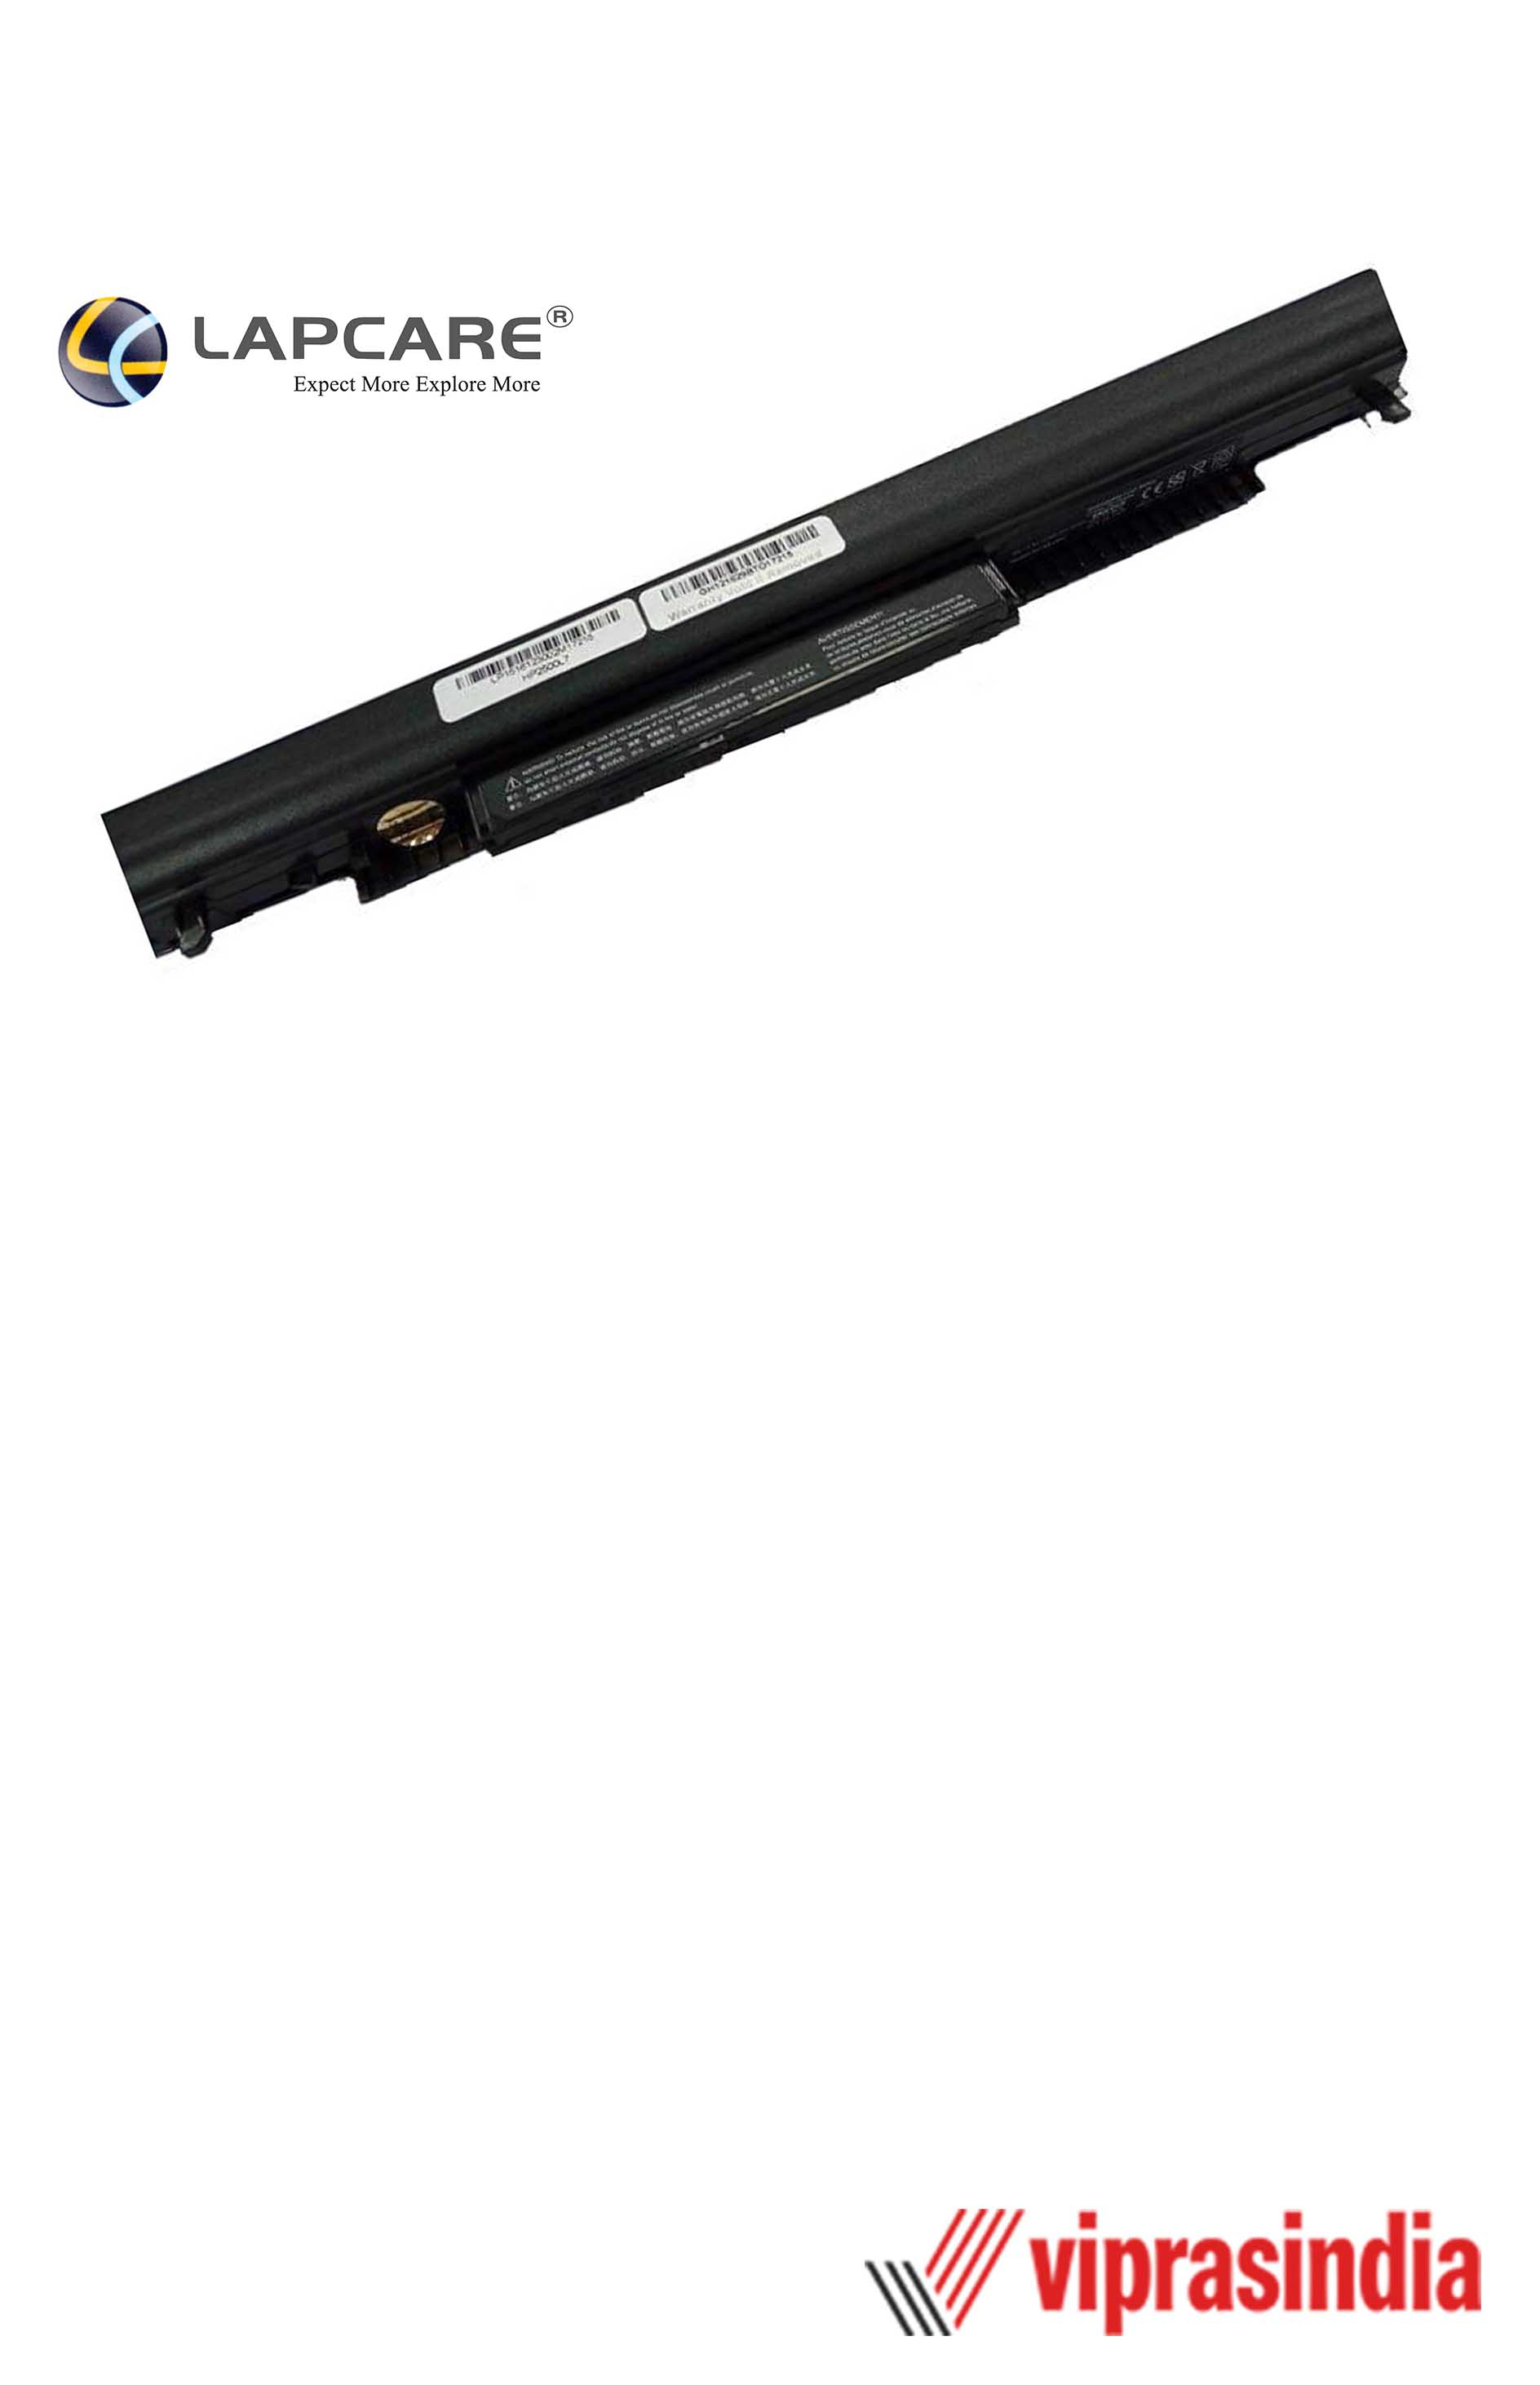 Laptop Battery Lapcare Compatible For HP HS04 4C